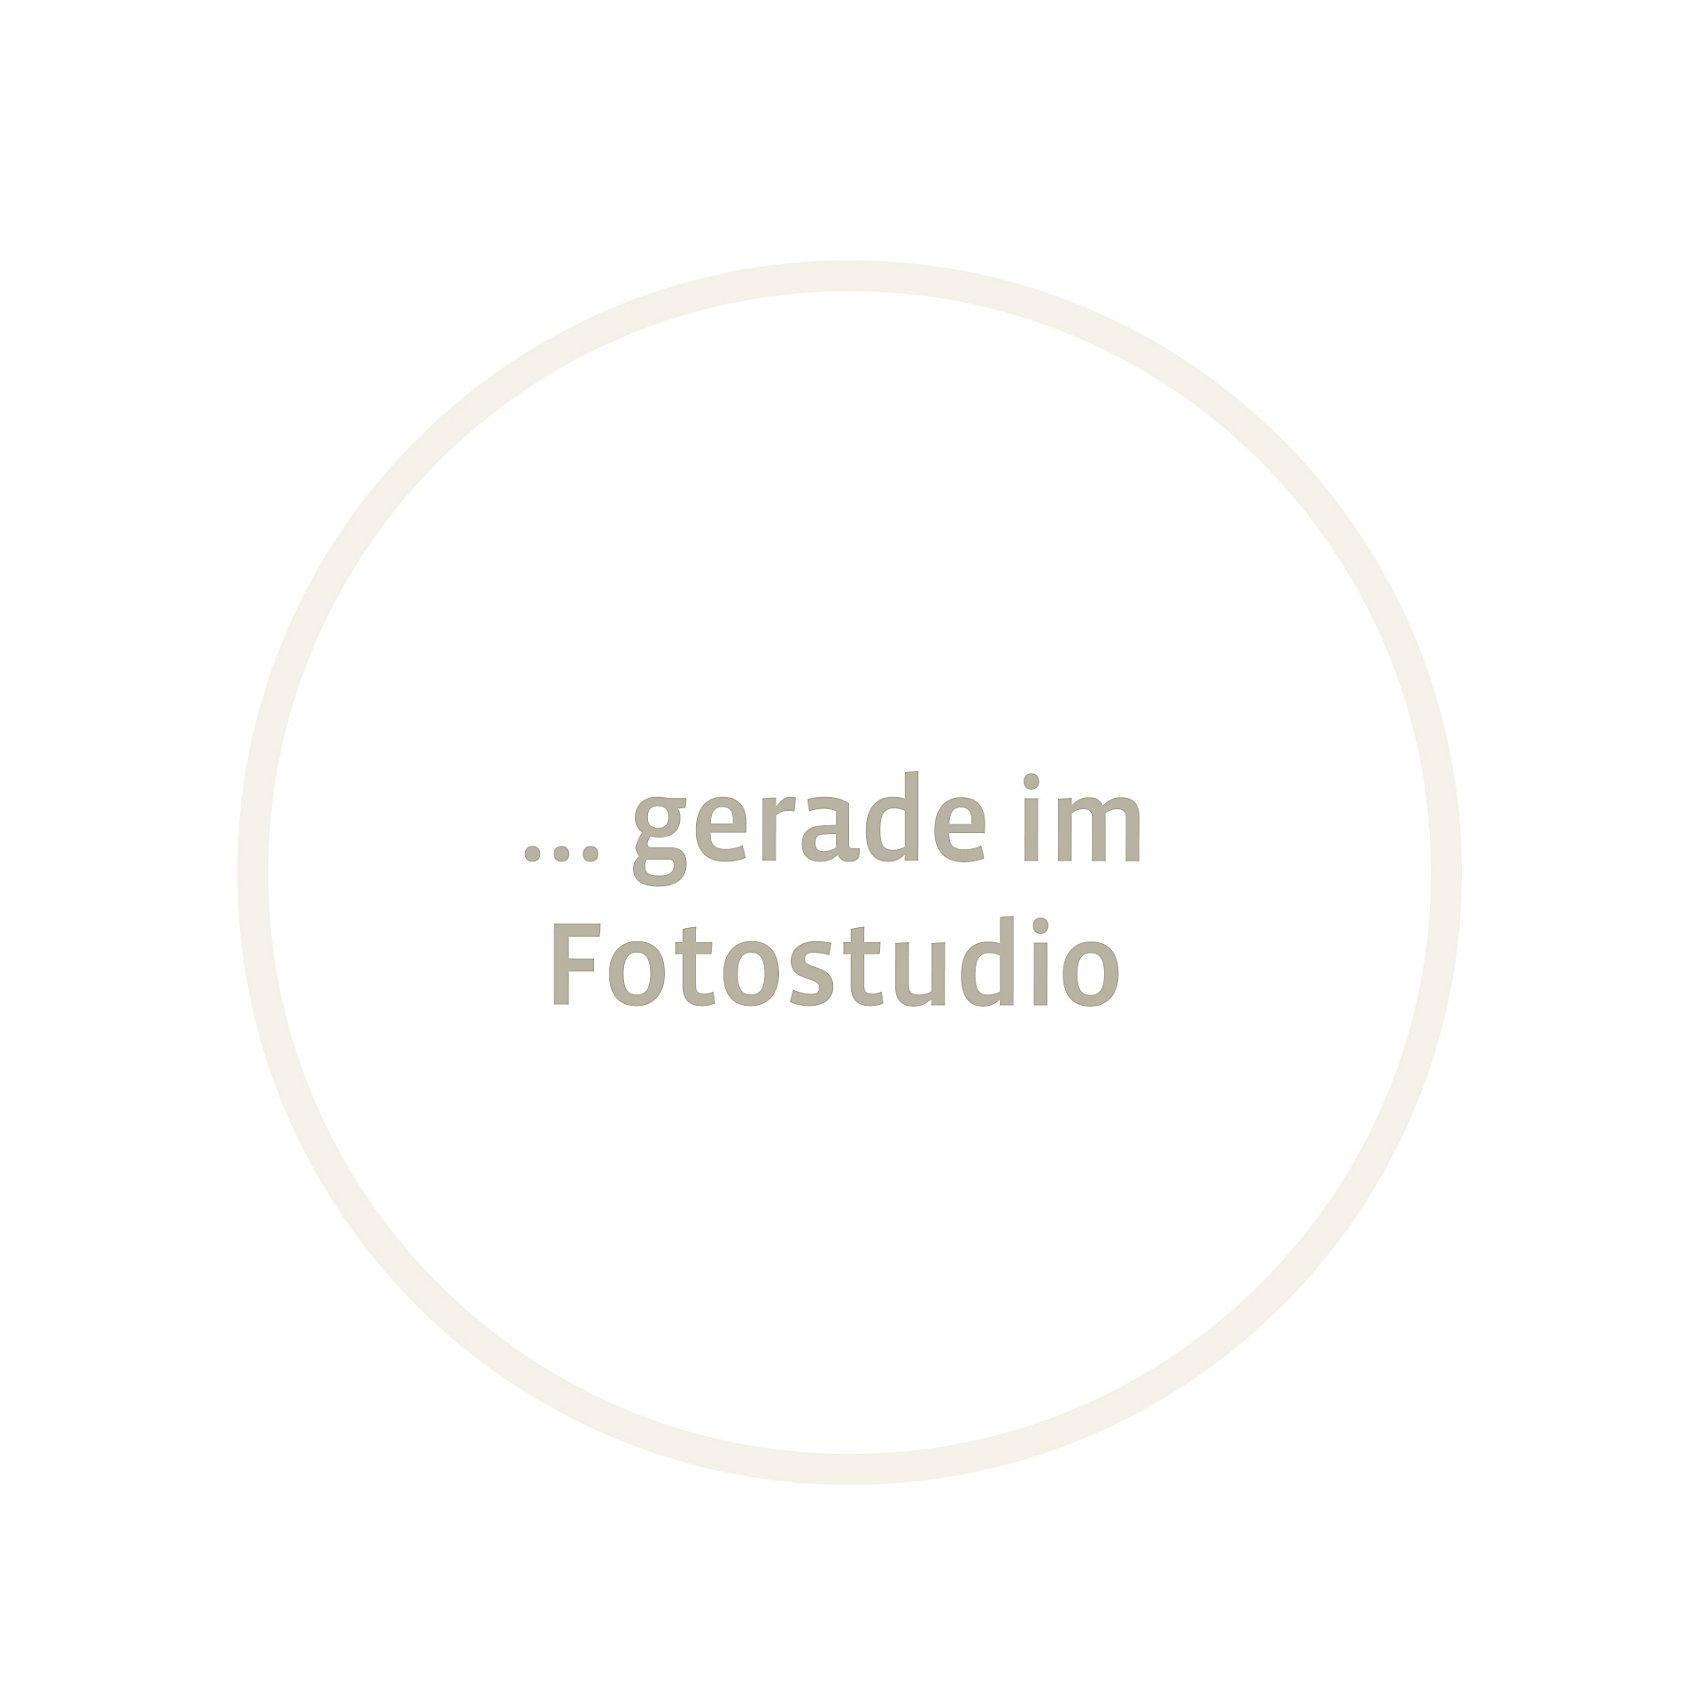 neu s oliver stiefel grau khaki 5765068 ebay. Black Bedroom Furniture Sets. Home Design Ideas